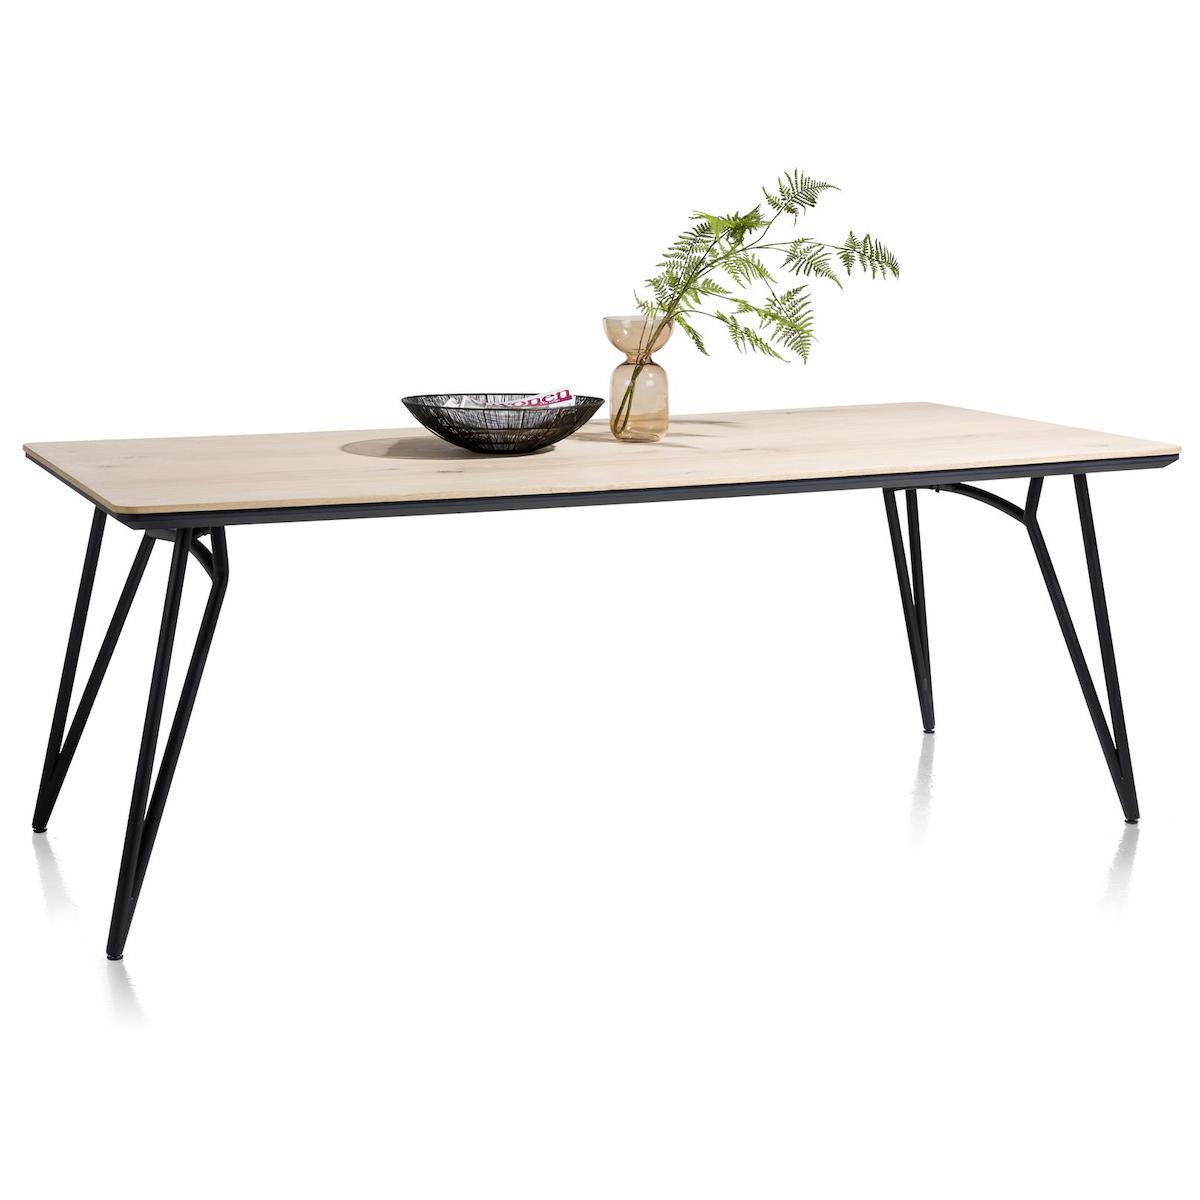 Table 240x100cm VIK Xooon natural